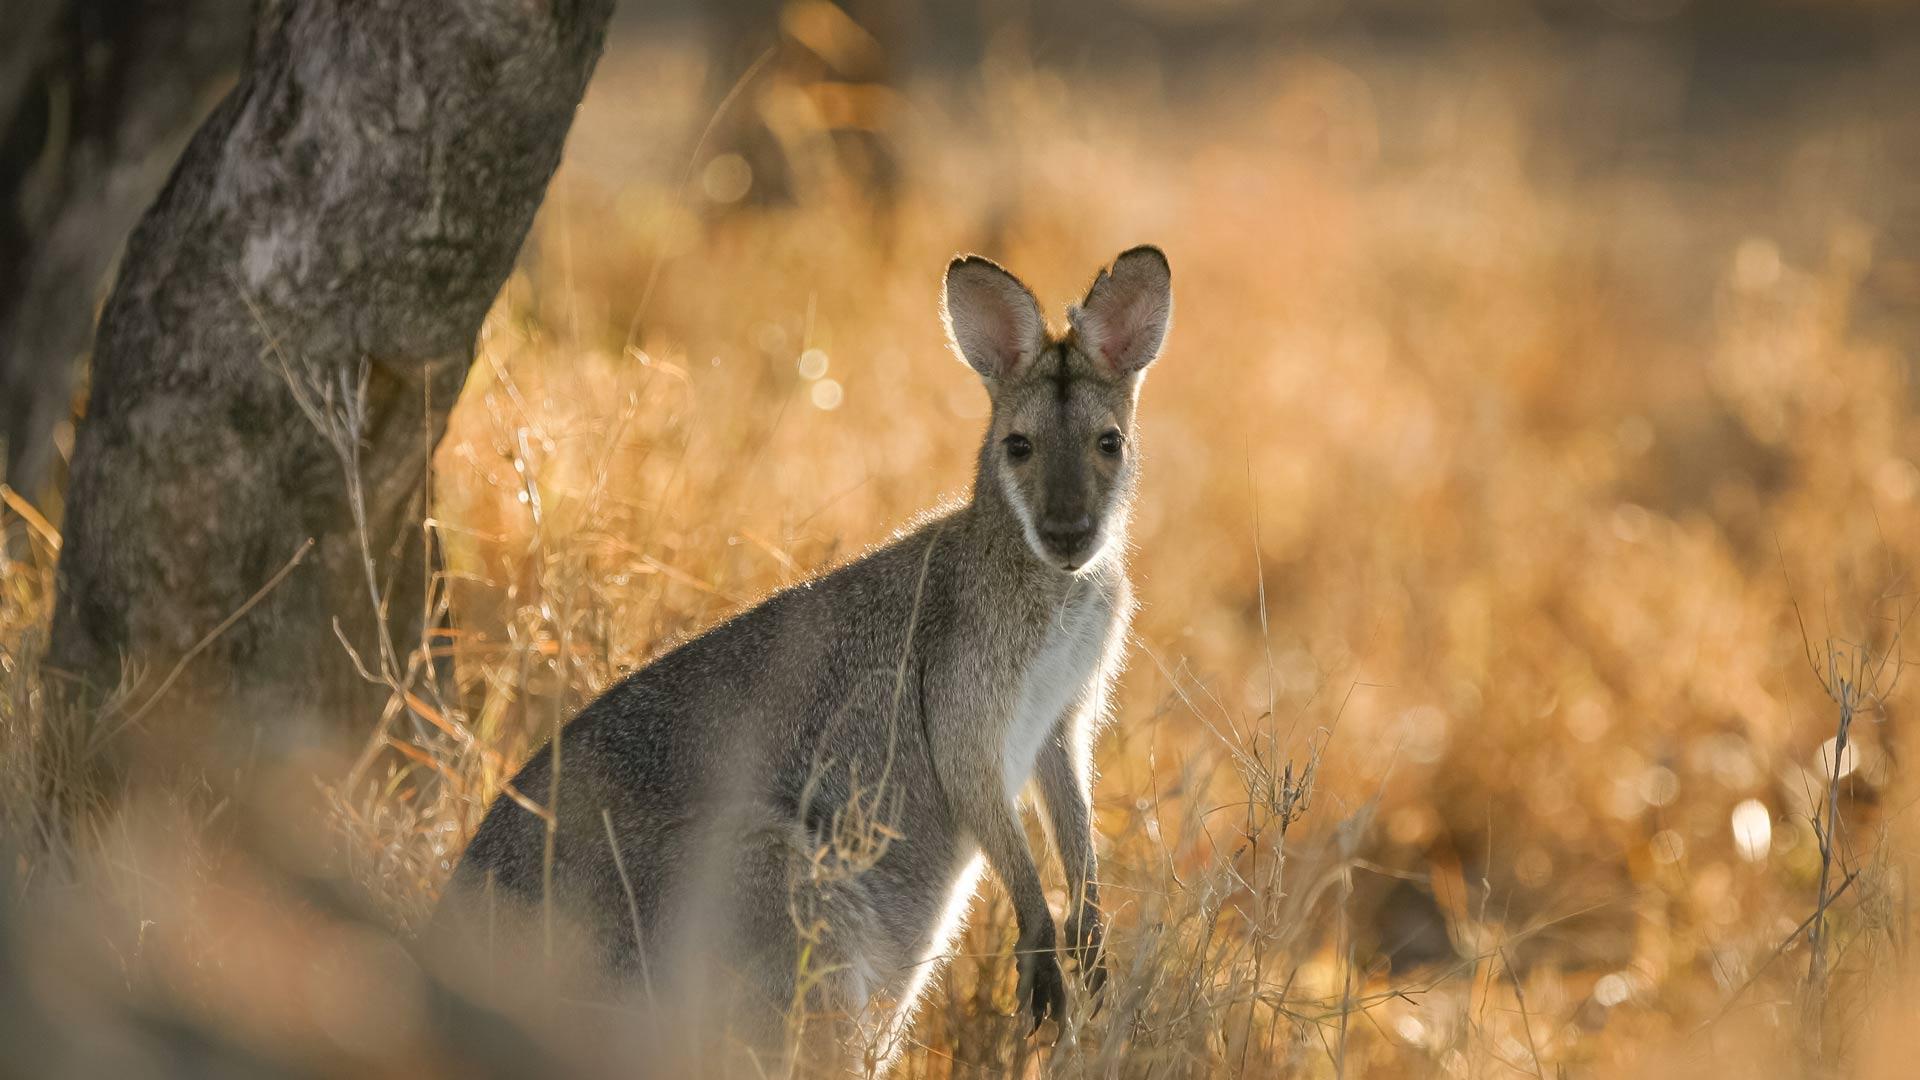 Australian Wildlife | Western Queensland | Day trip | Australian Outback